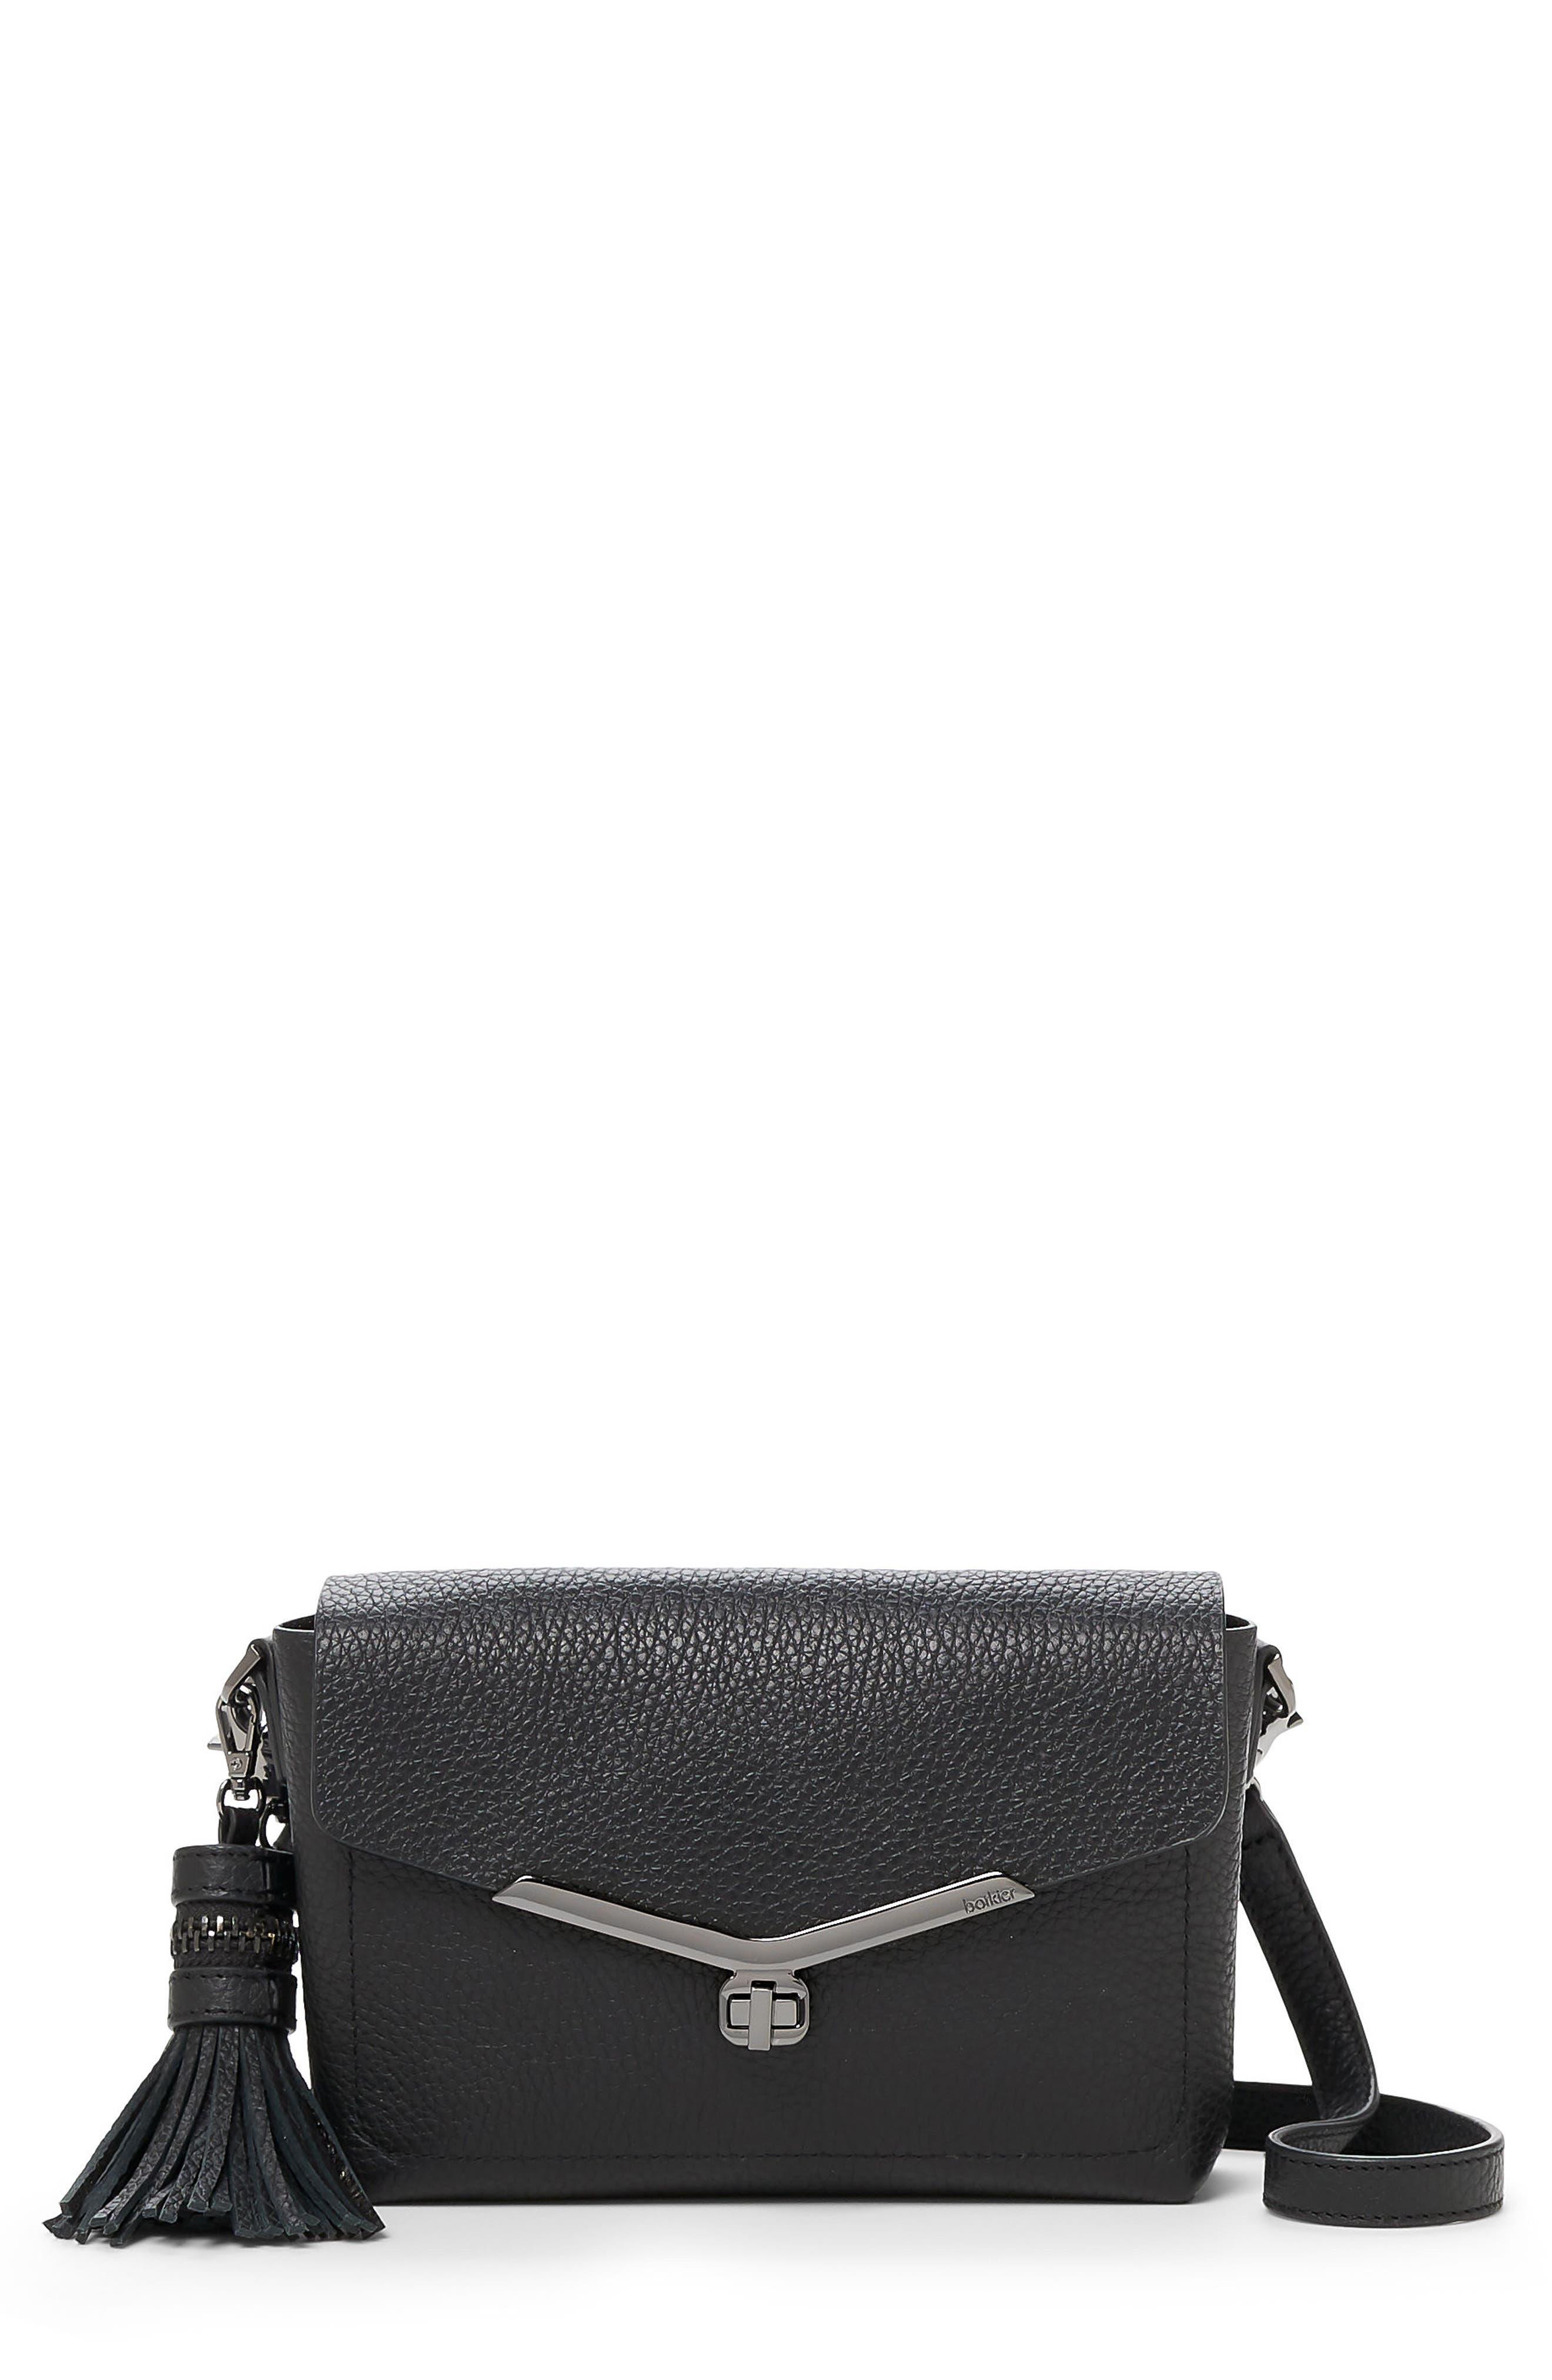 Vivi Leather Crossbody Bag,                         Main,                         color, Black